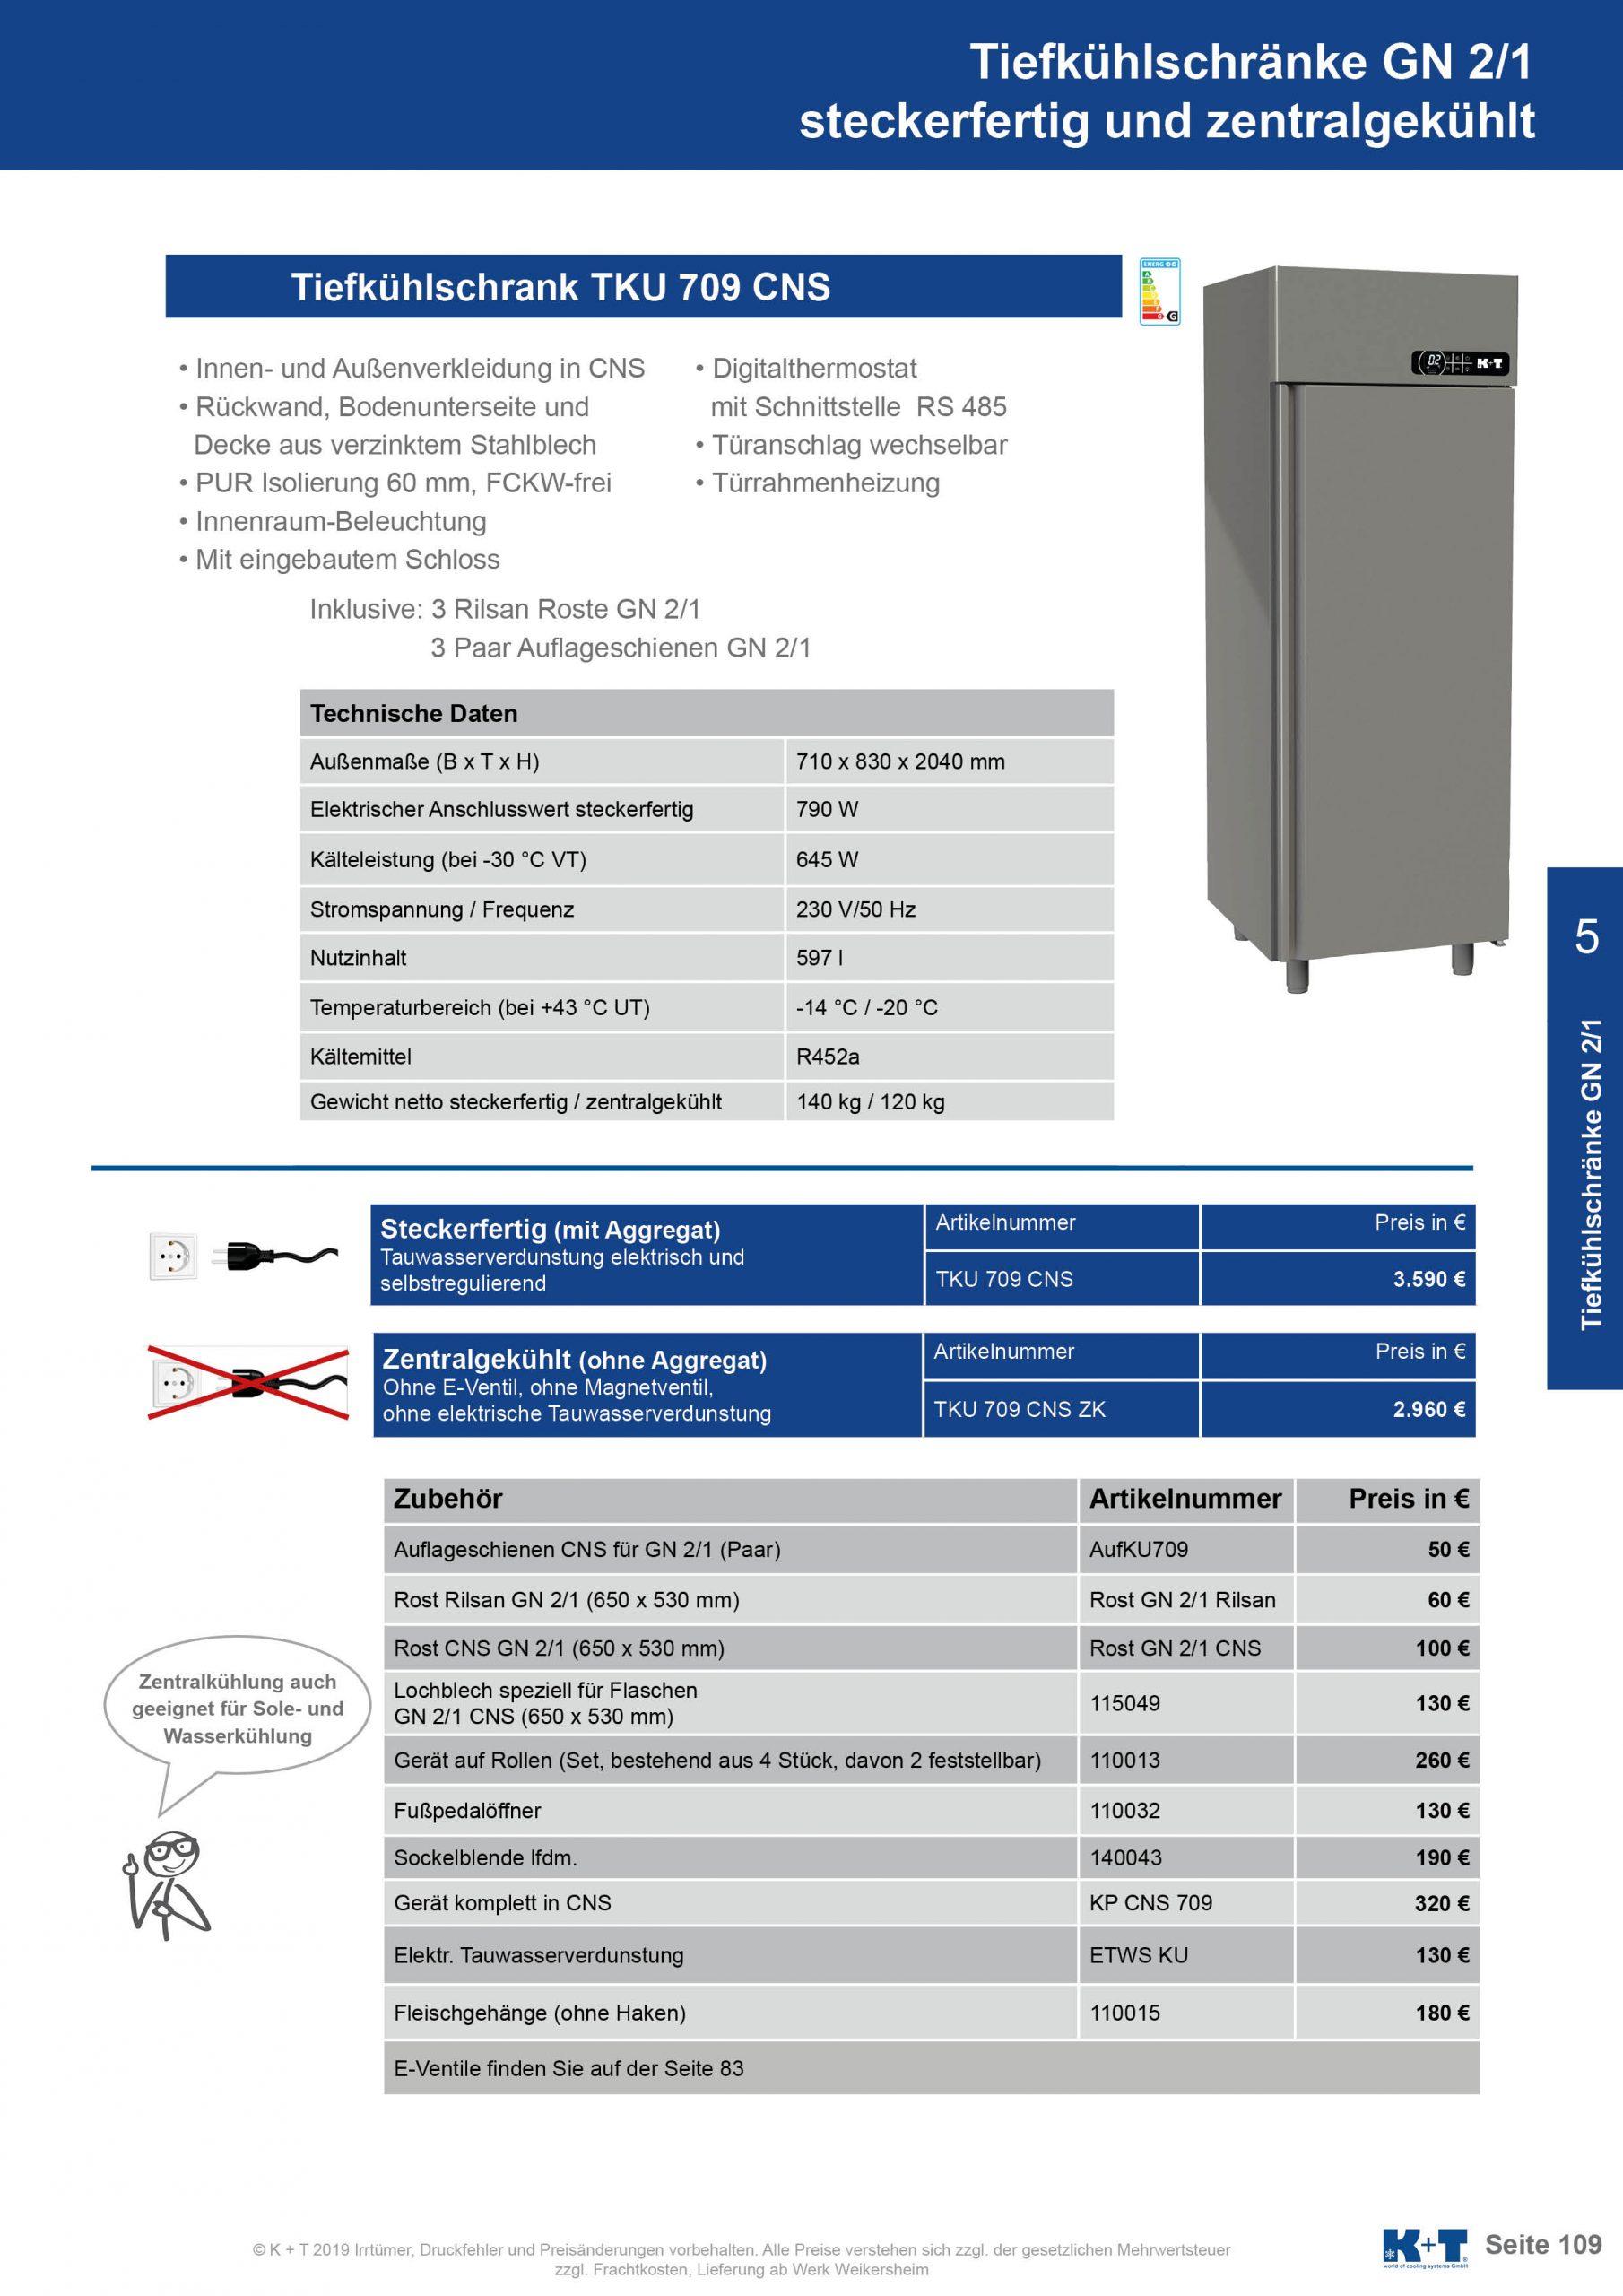 Tiefkühlschränke GN 2_1 Tiefkühlschrank steckerfertig